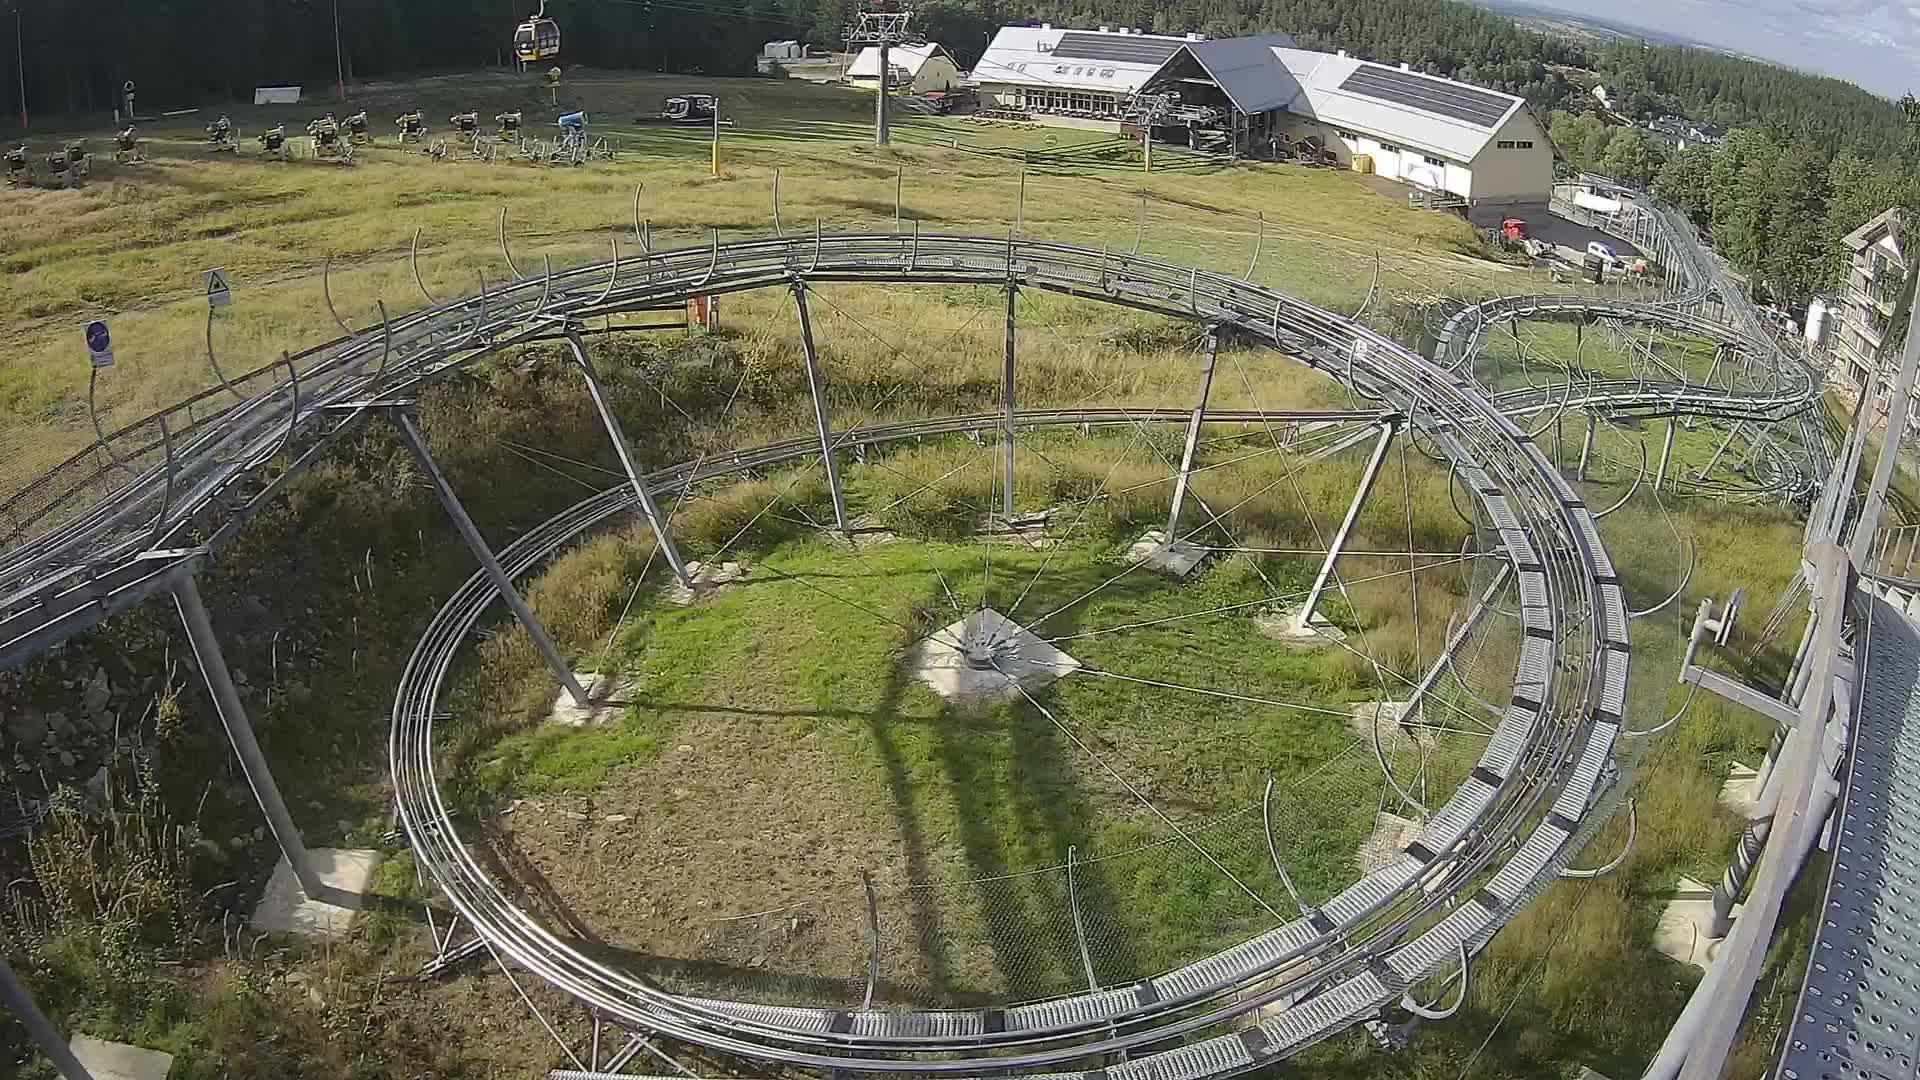 Webcam Skigebiet Swieradow Zdroj cam 3 - Isergebirge